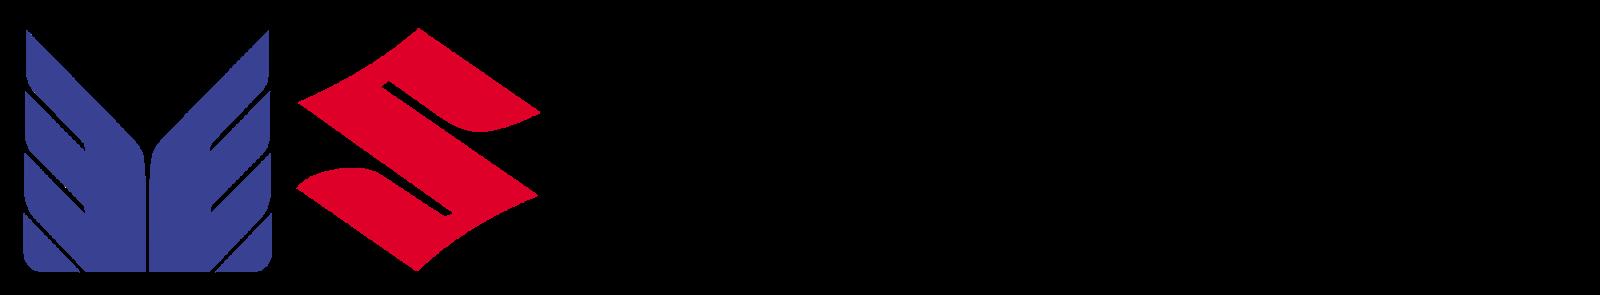 Automotive Database: Maruti Suzuki